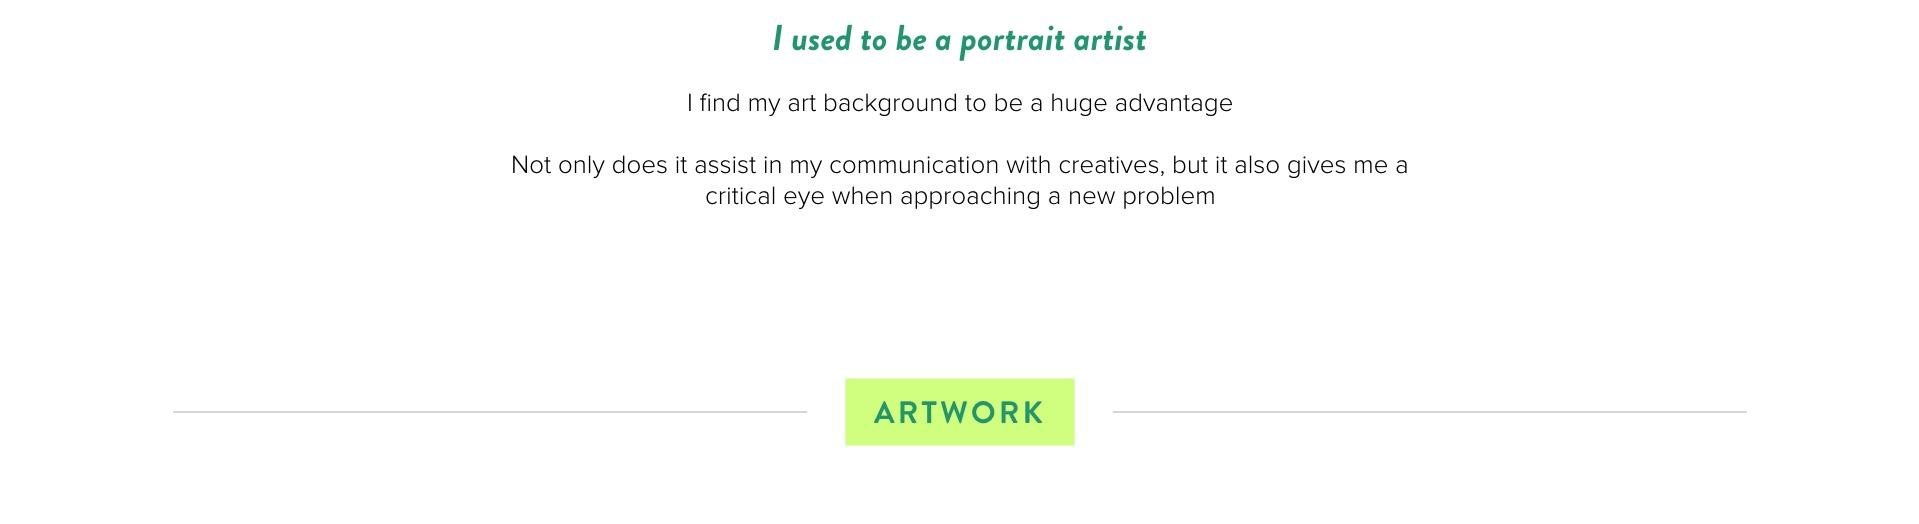 Portfolio+Work.001.jpg